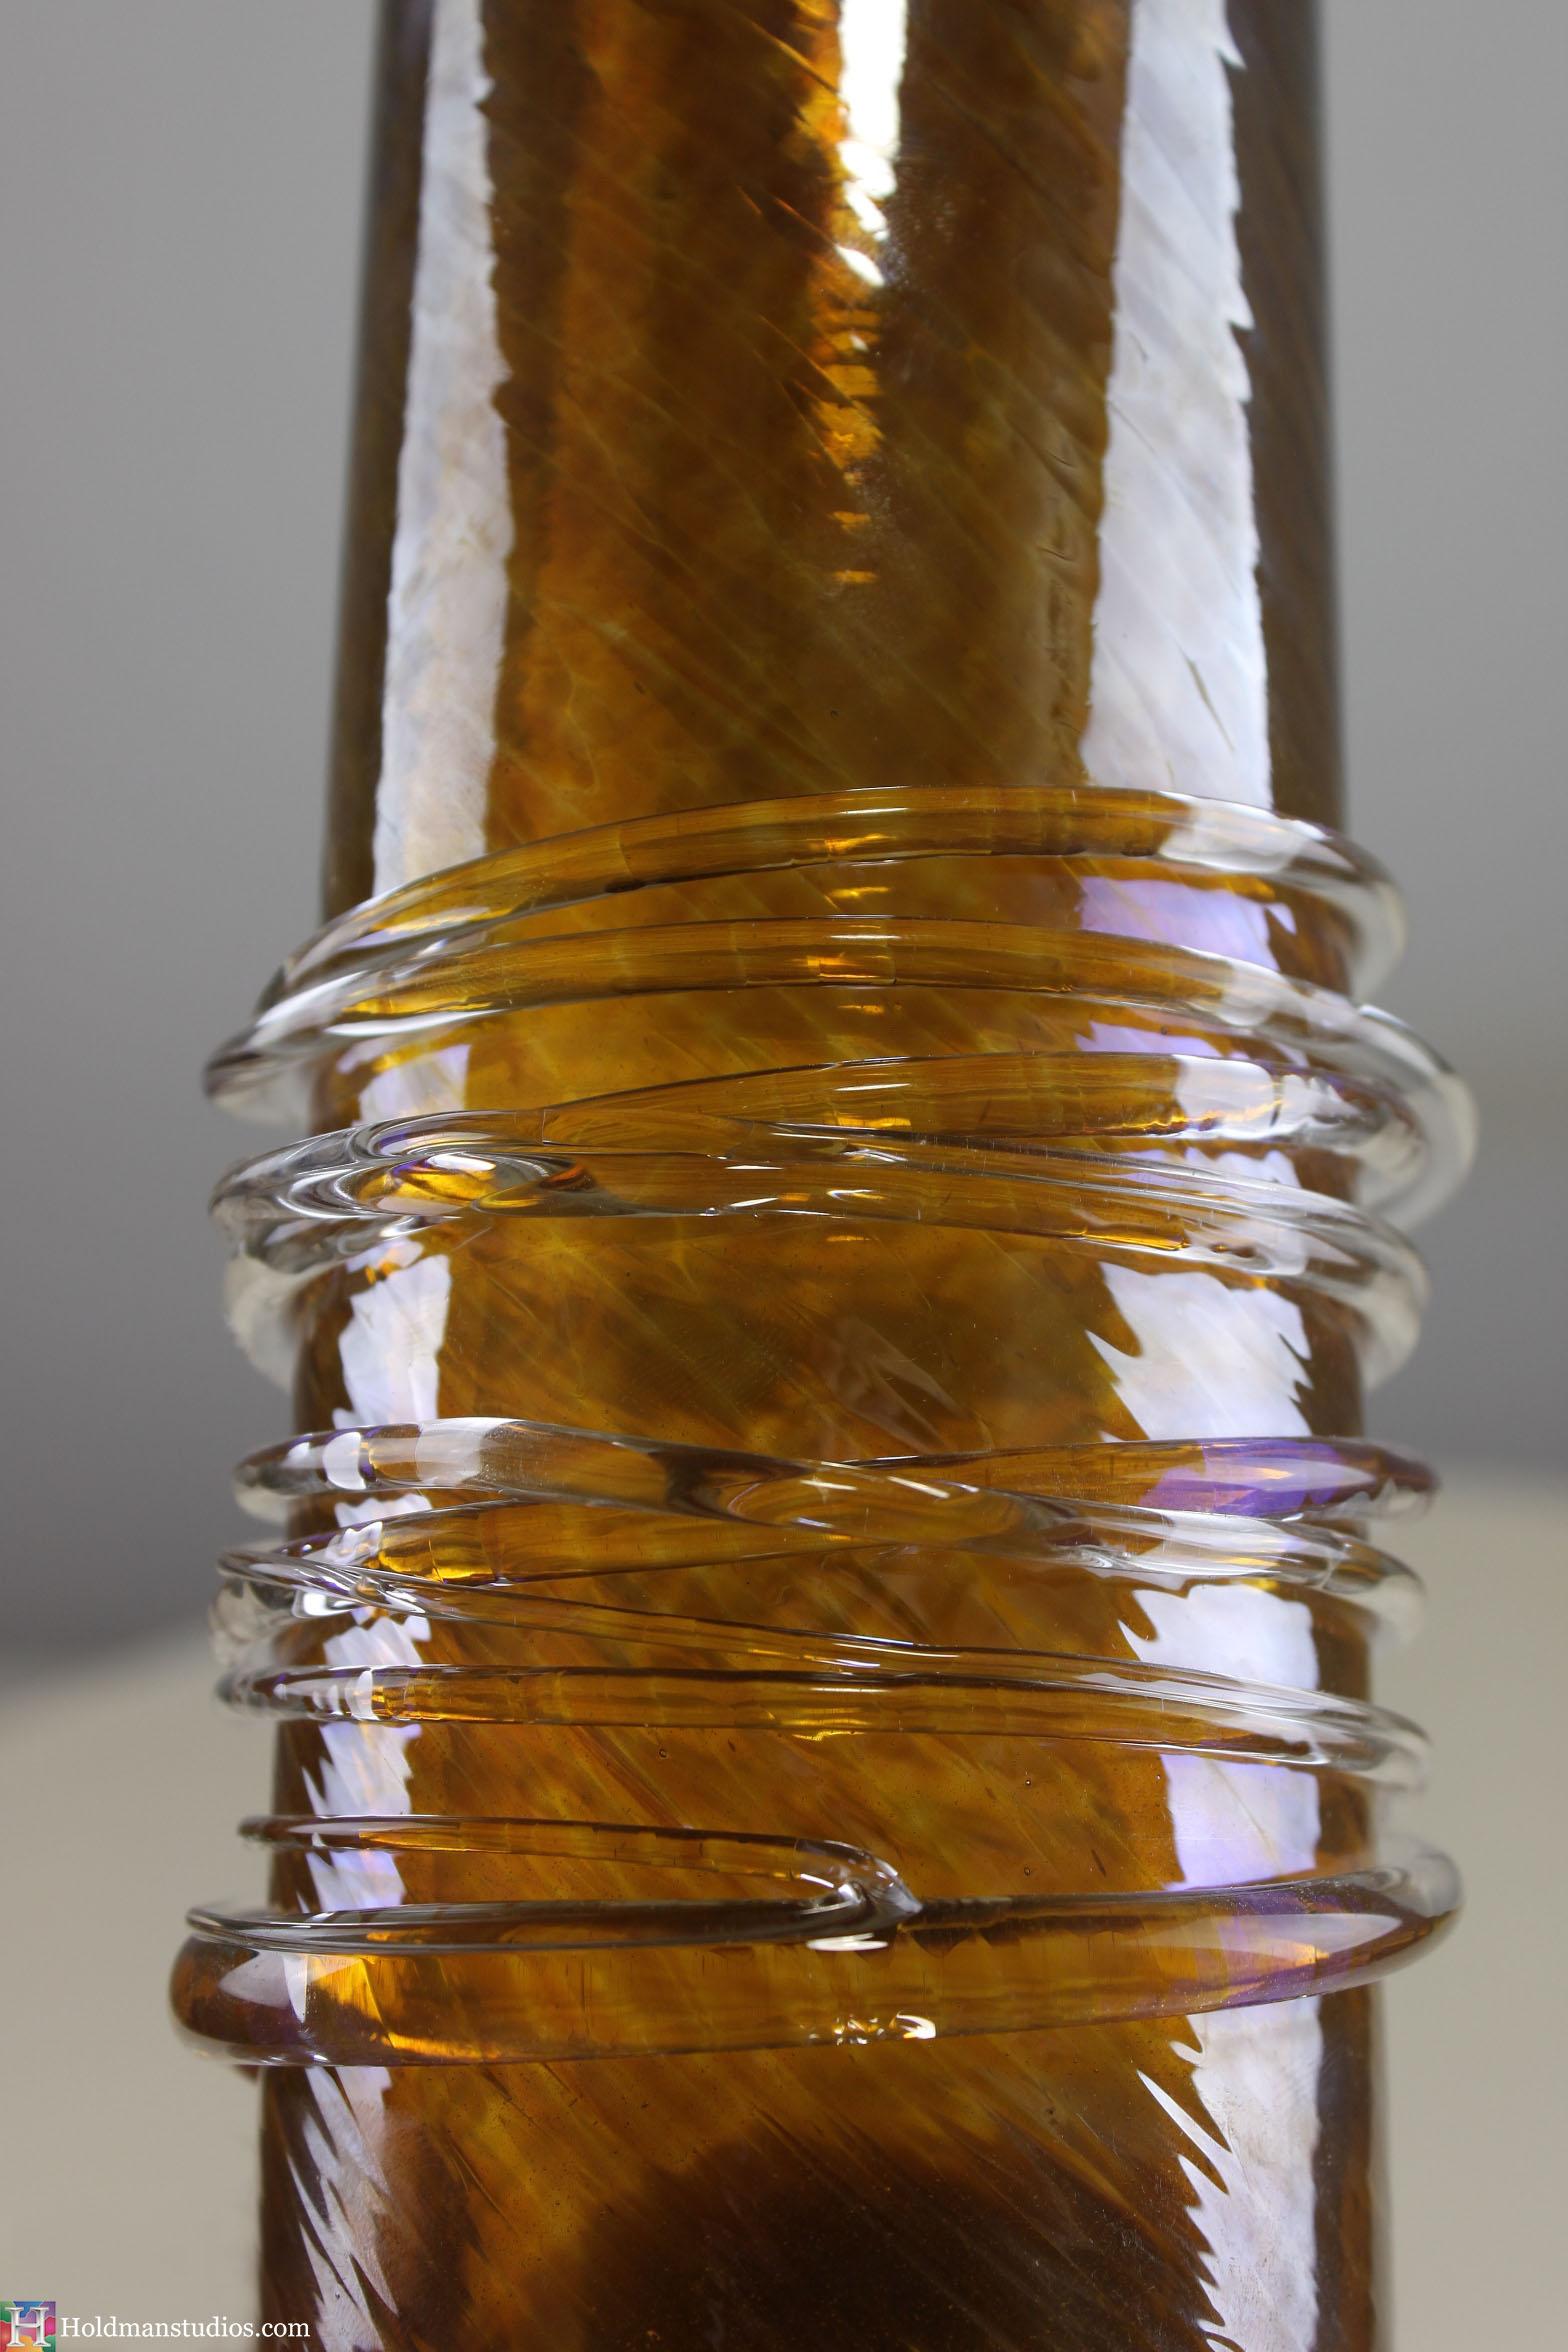 Holdman-studios-hand-blown-glass-lighting-marriott-hotel-detail.jpg